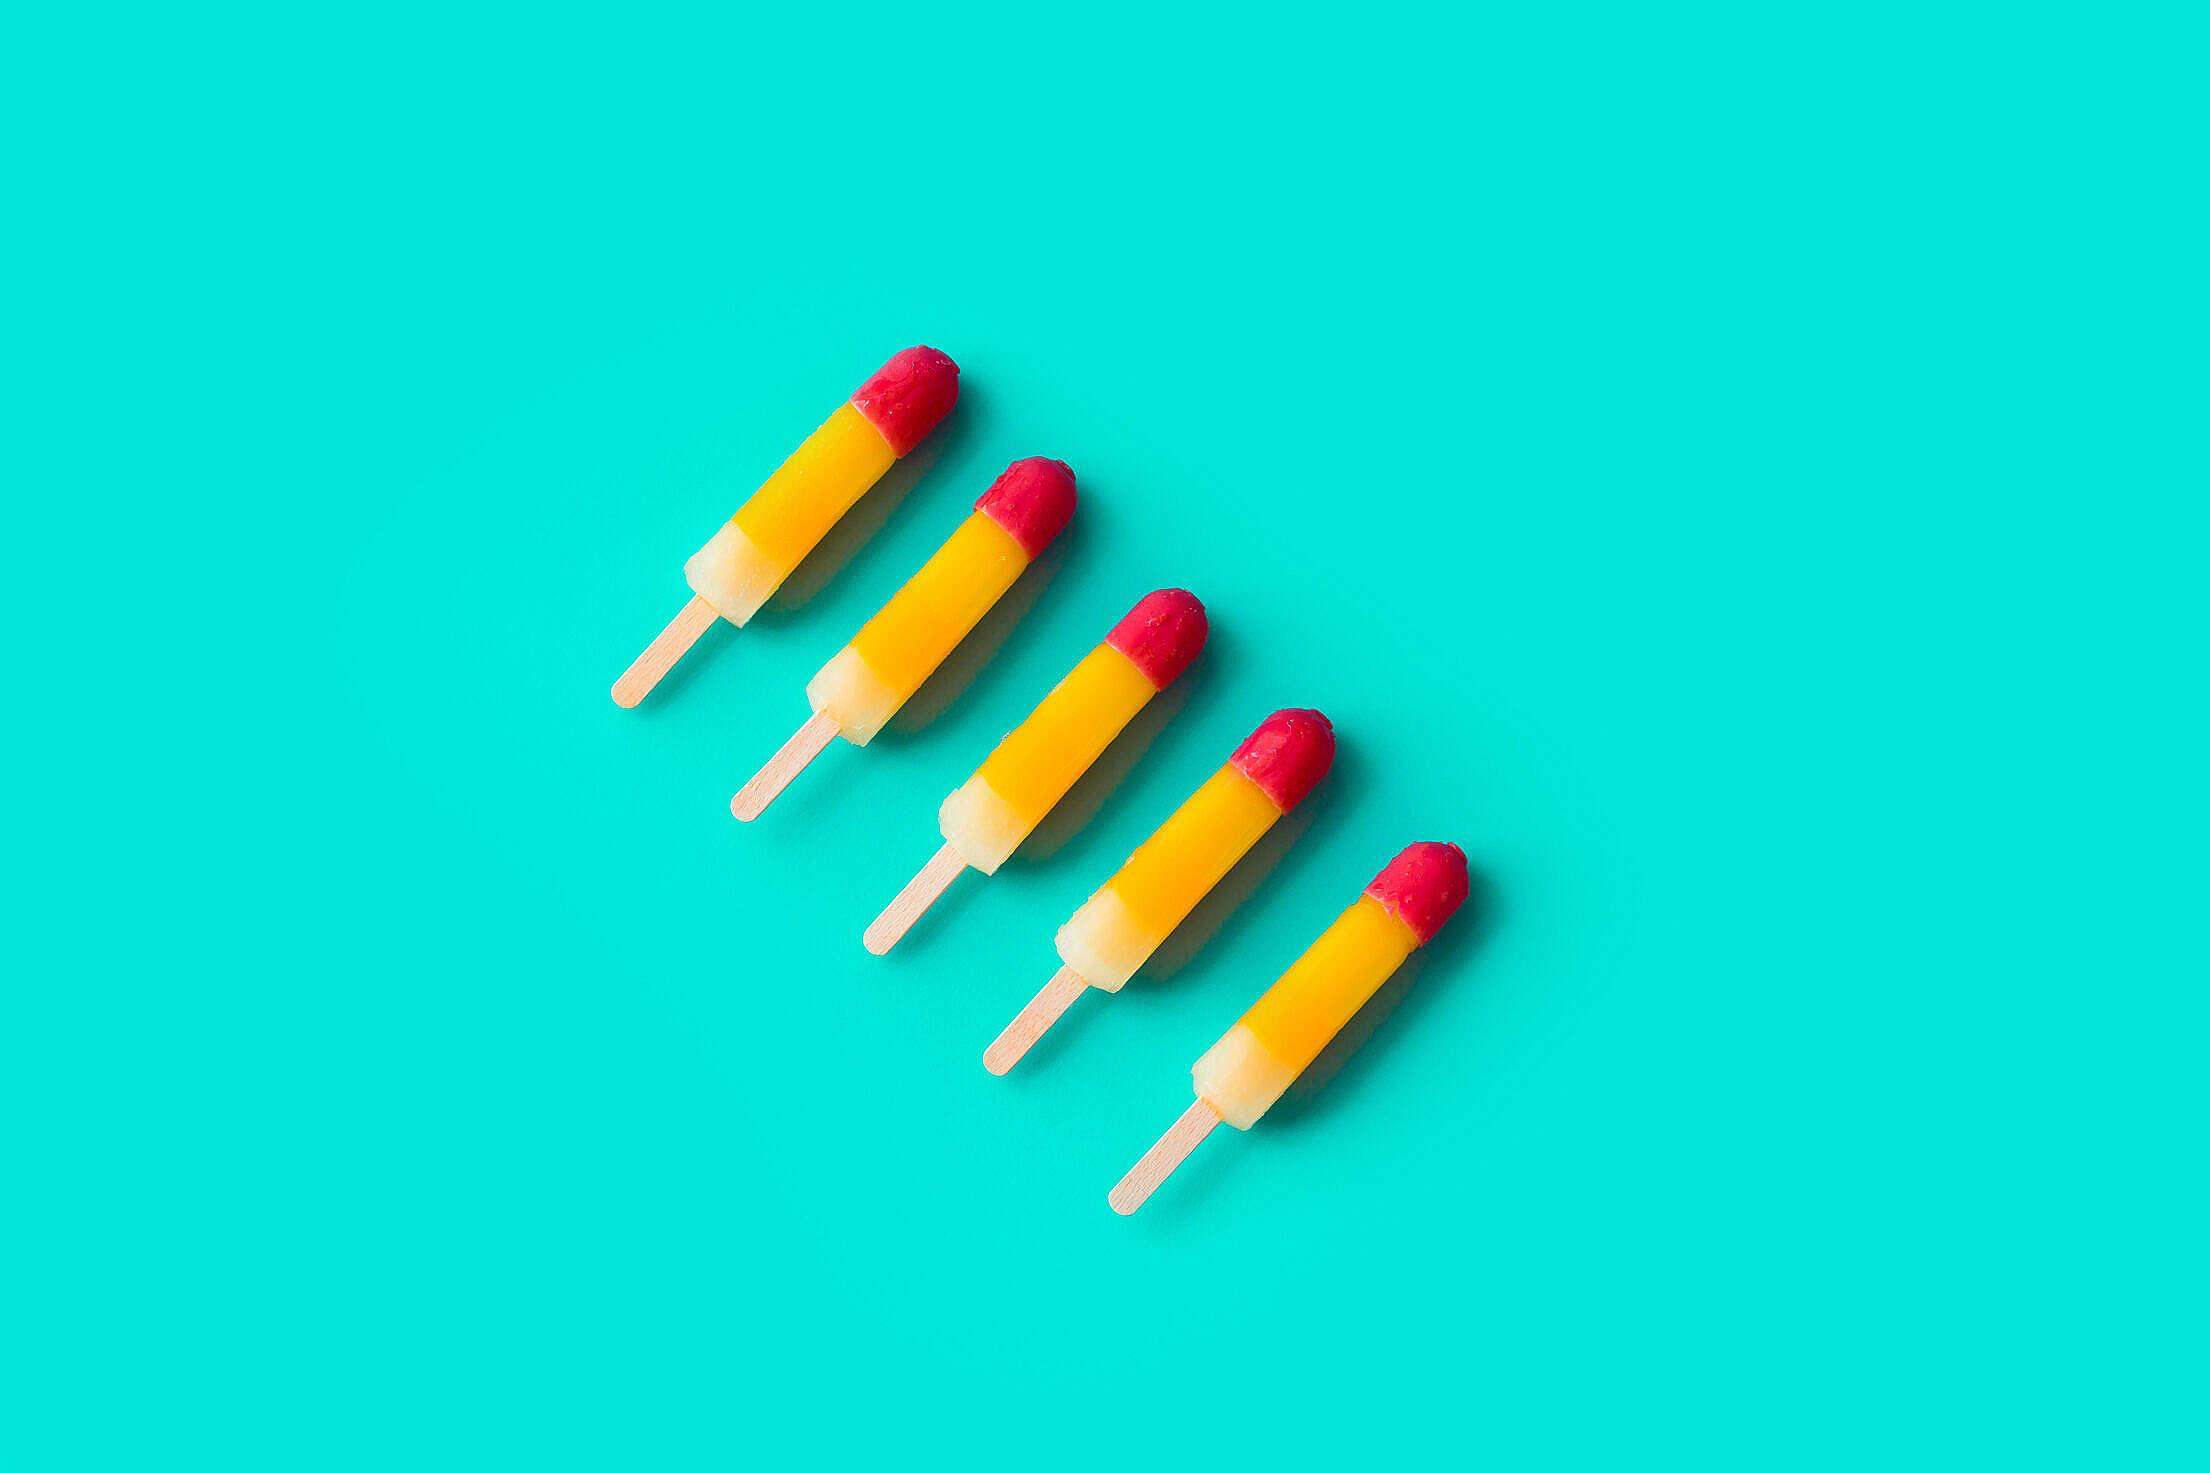 Ice Lolly Pastel Free Stock Photo